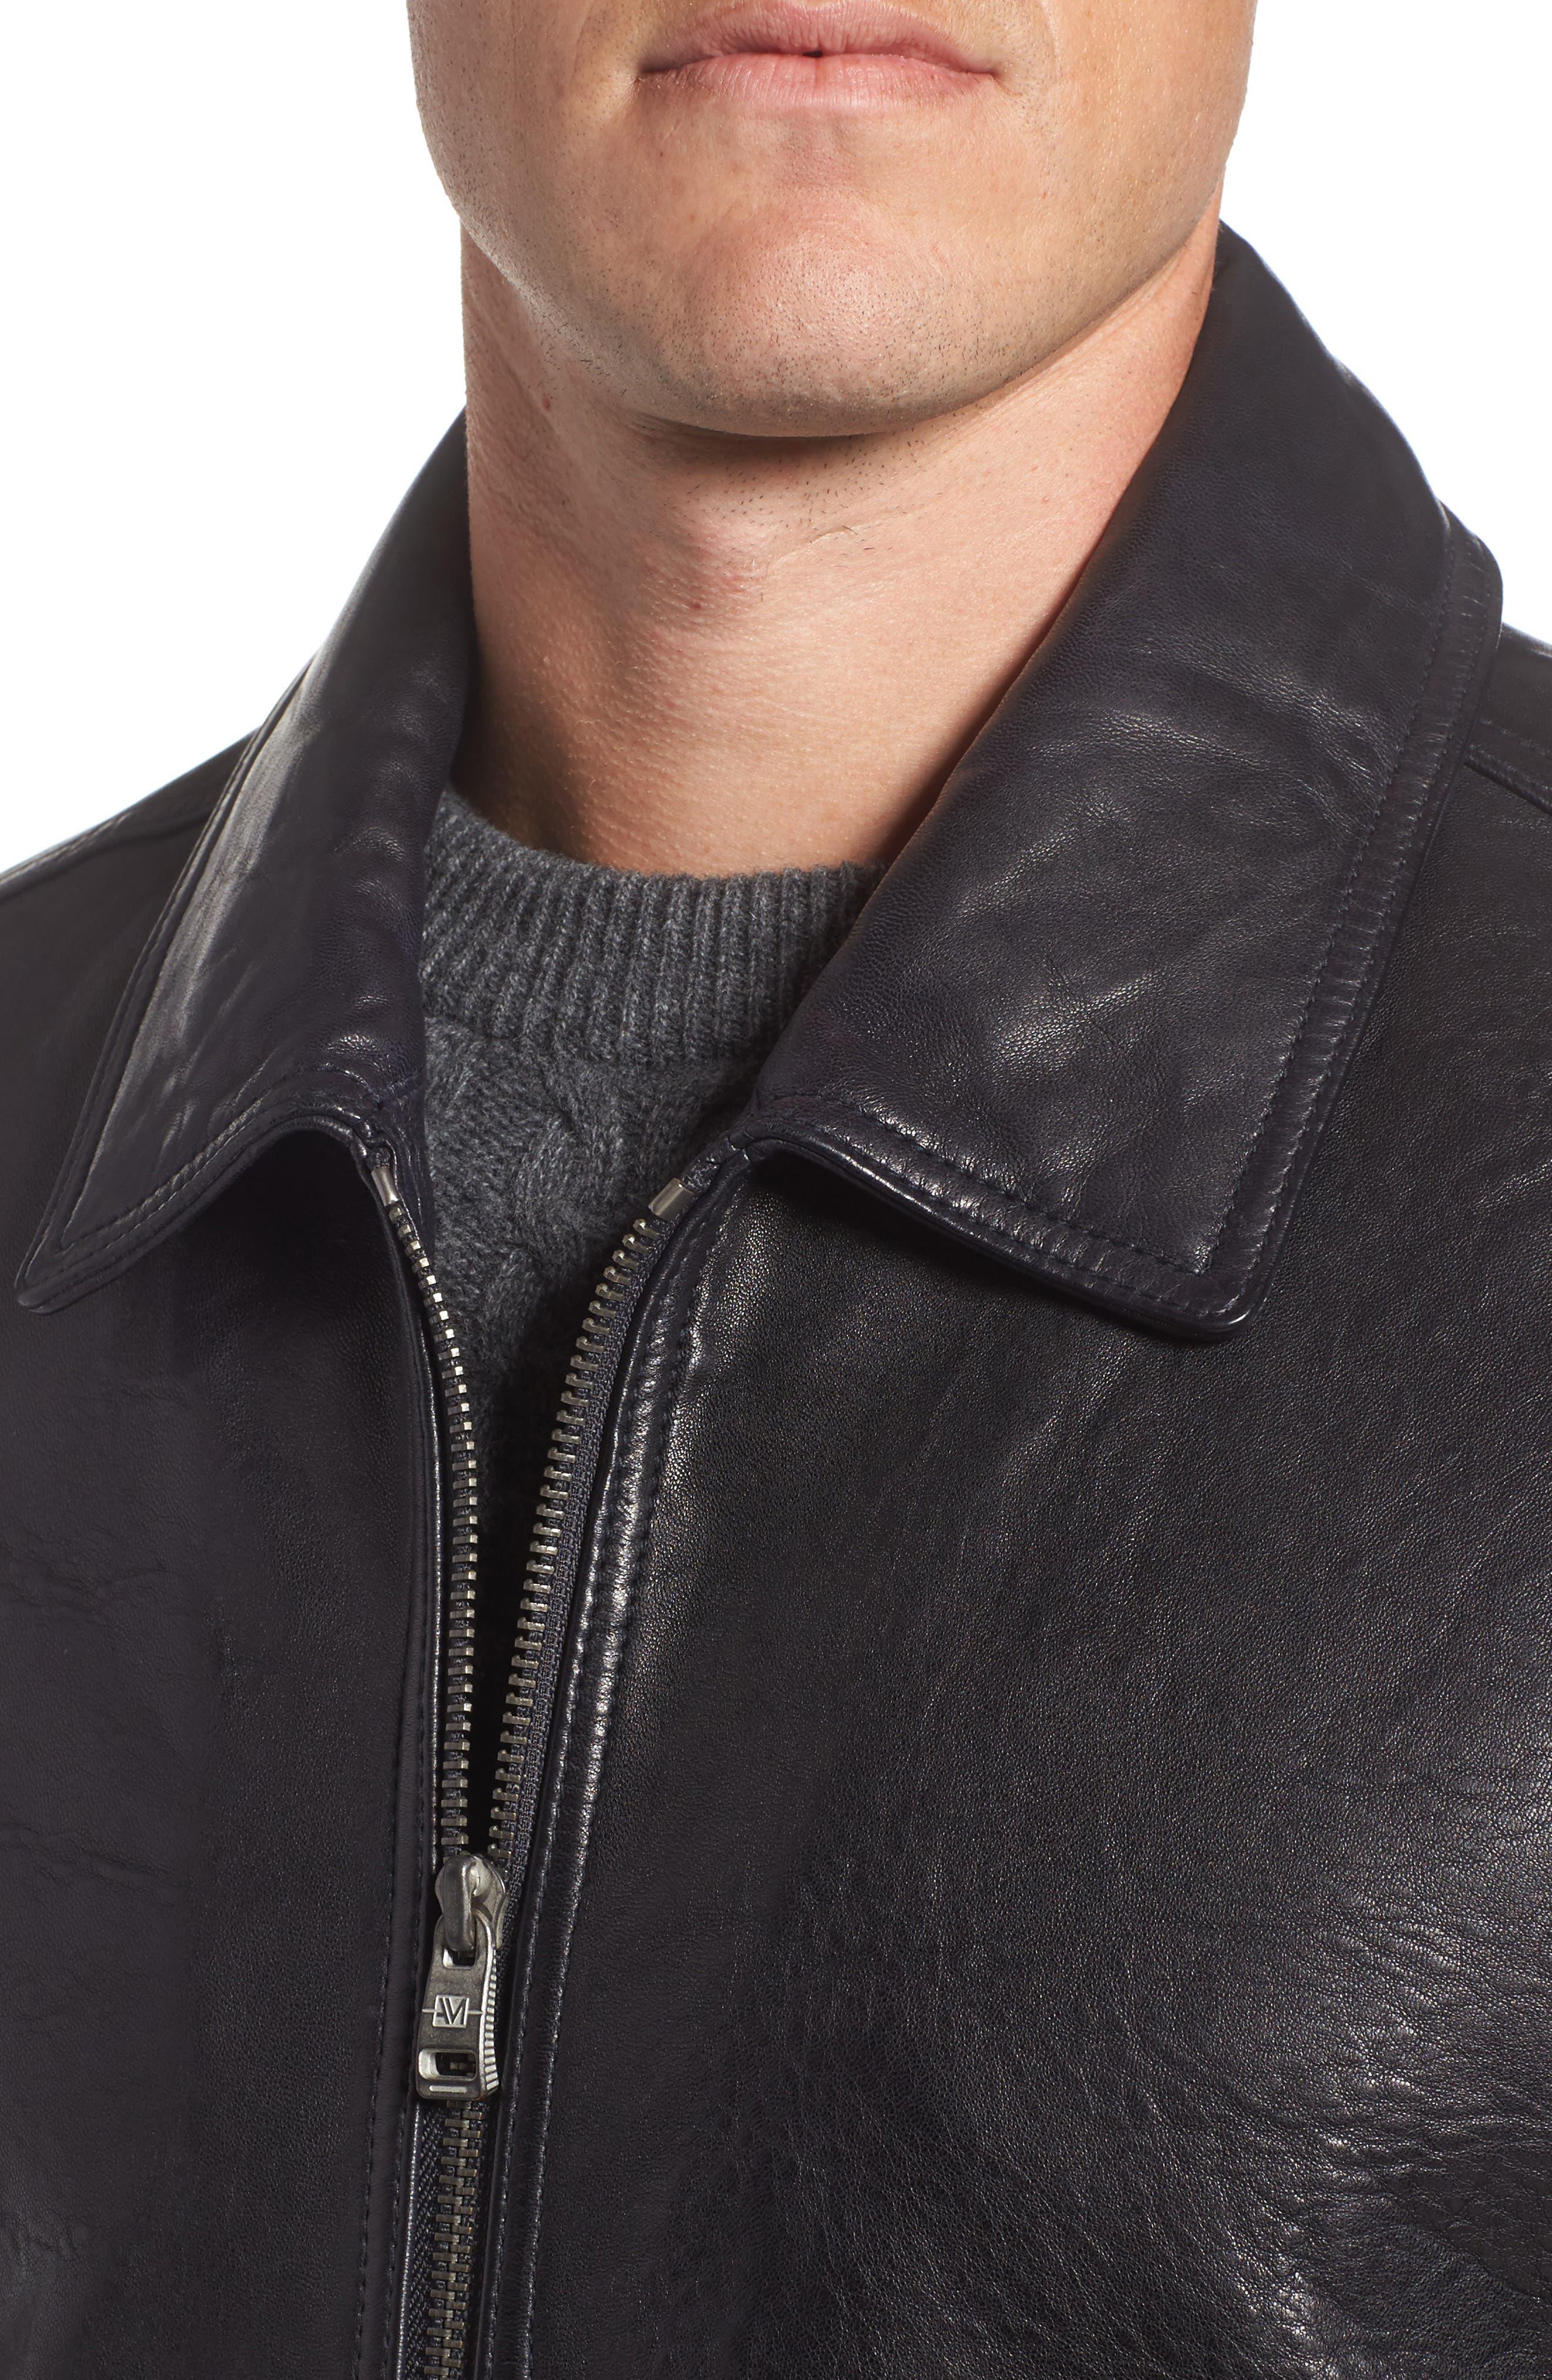 Morrison Spread Collar Leather Jacket,                             Alternate thumbnail 4, color,                             Ink